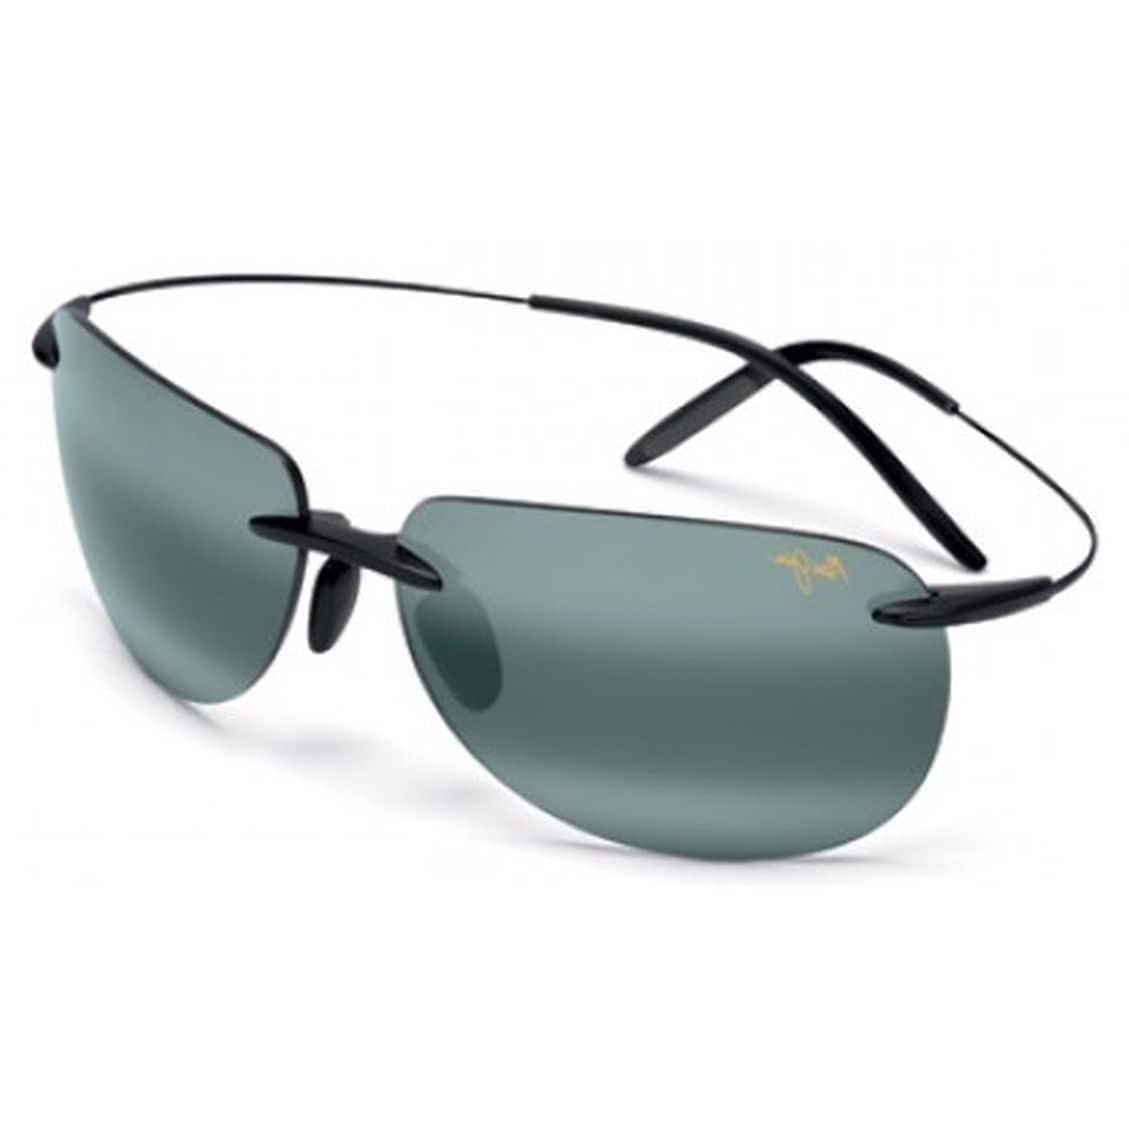 b49259bb2f12 Shop Maui Jim Unisex 'Nakalele' 527 02 Titanium Polarized Sunglasses ...